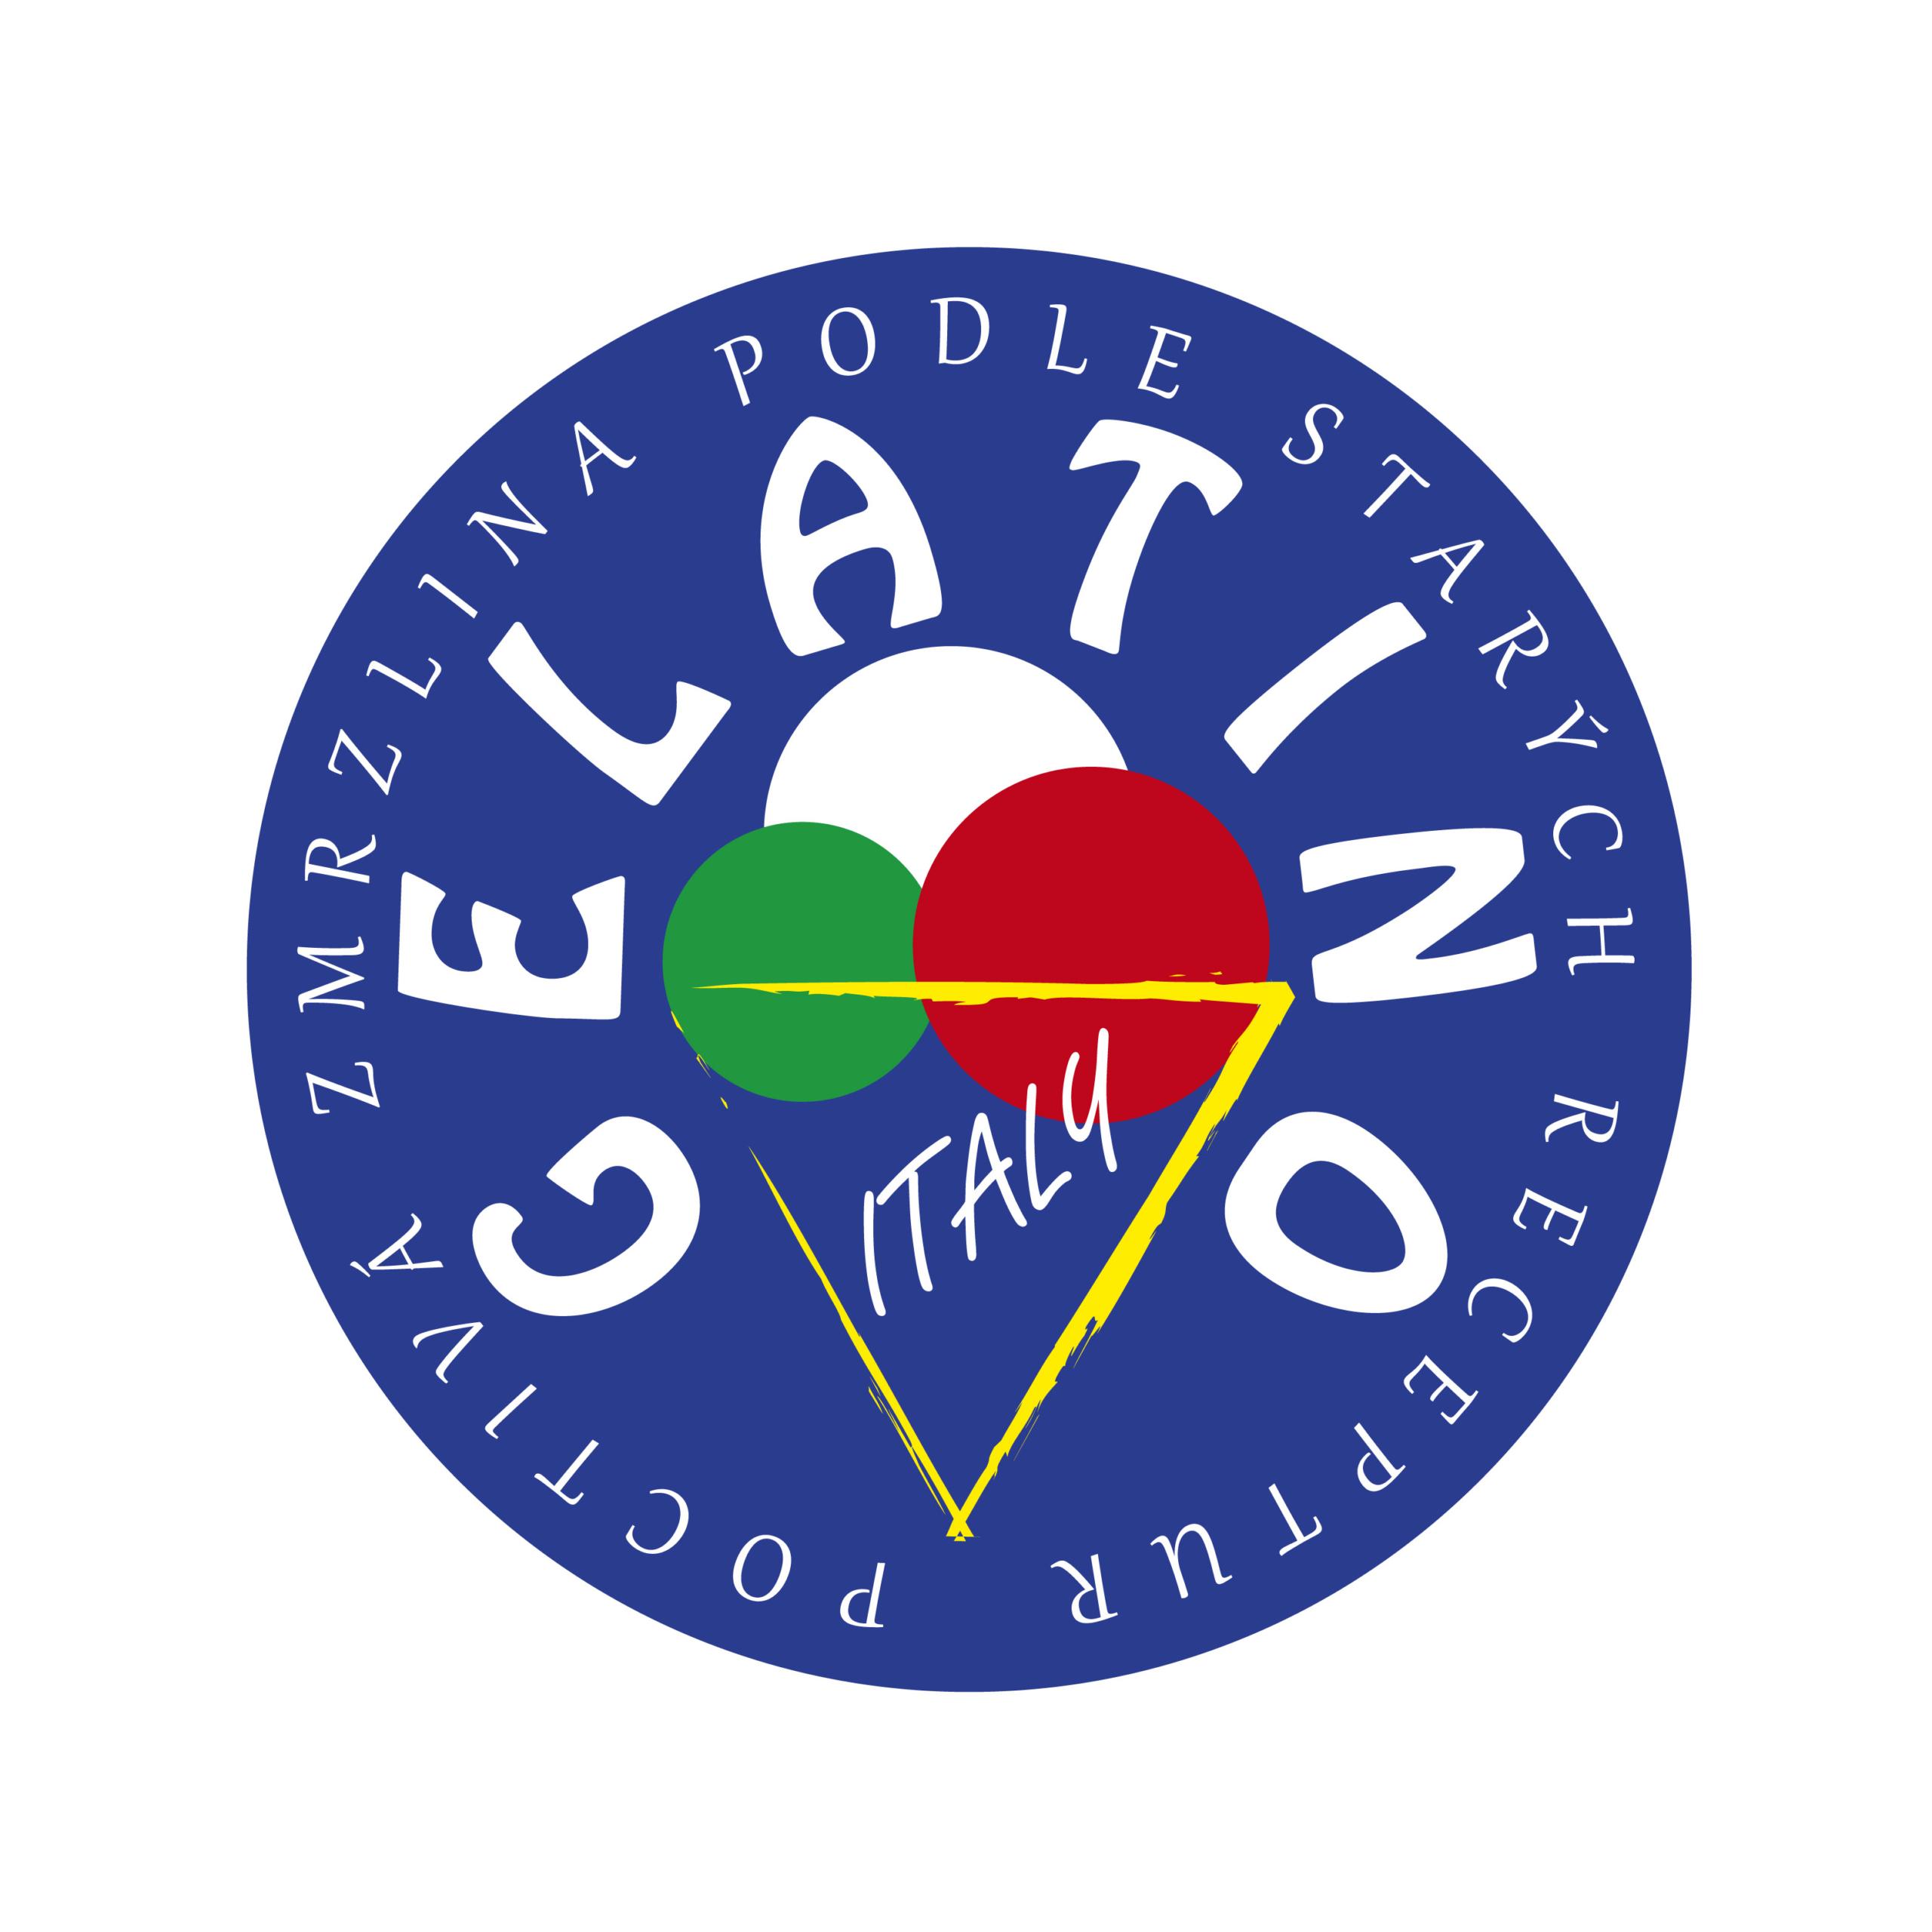 Návrh designu loga zmrzliny GELATINO